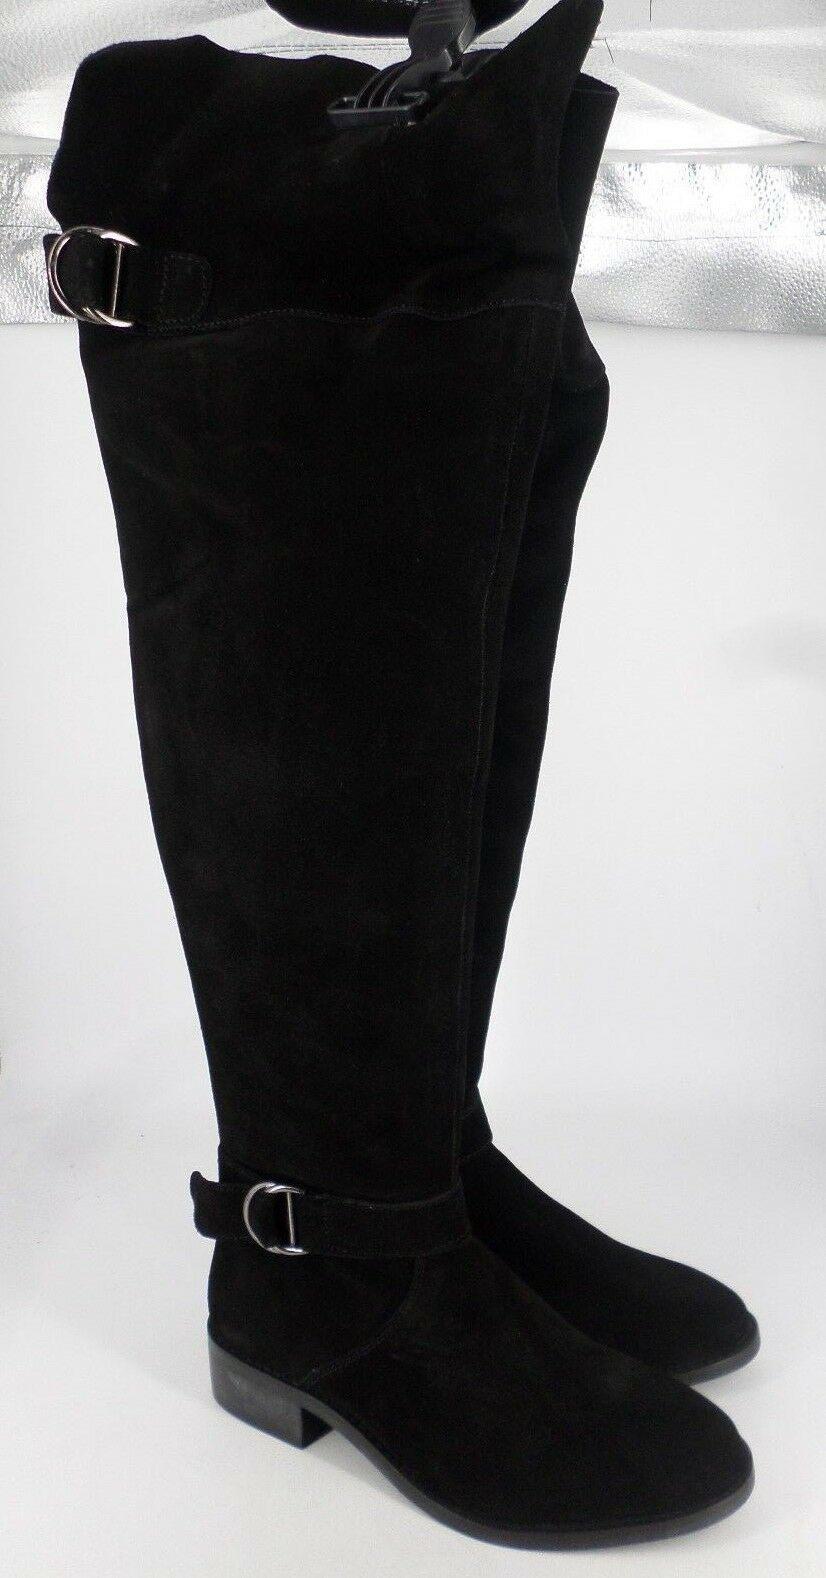 efd1d6fb455 Asos Knowledge Over Knee Boots Black Size UK 4.5 EU 37.5 BT03 22 ...